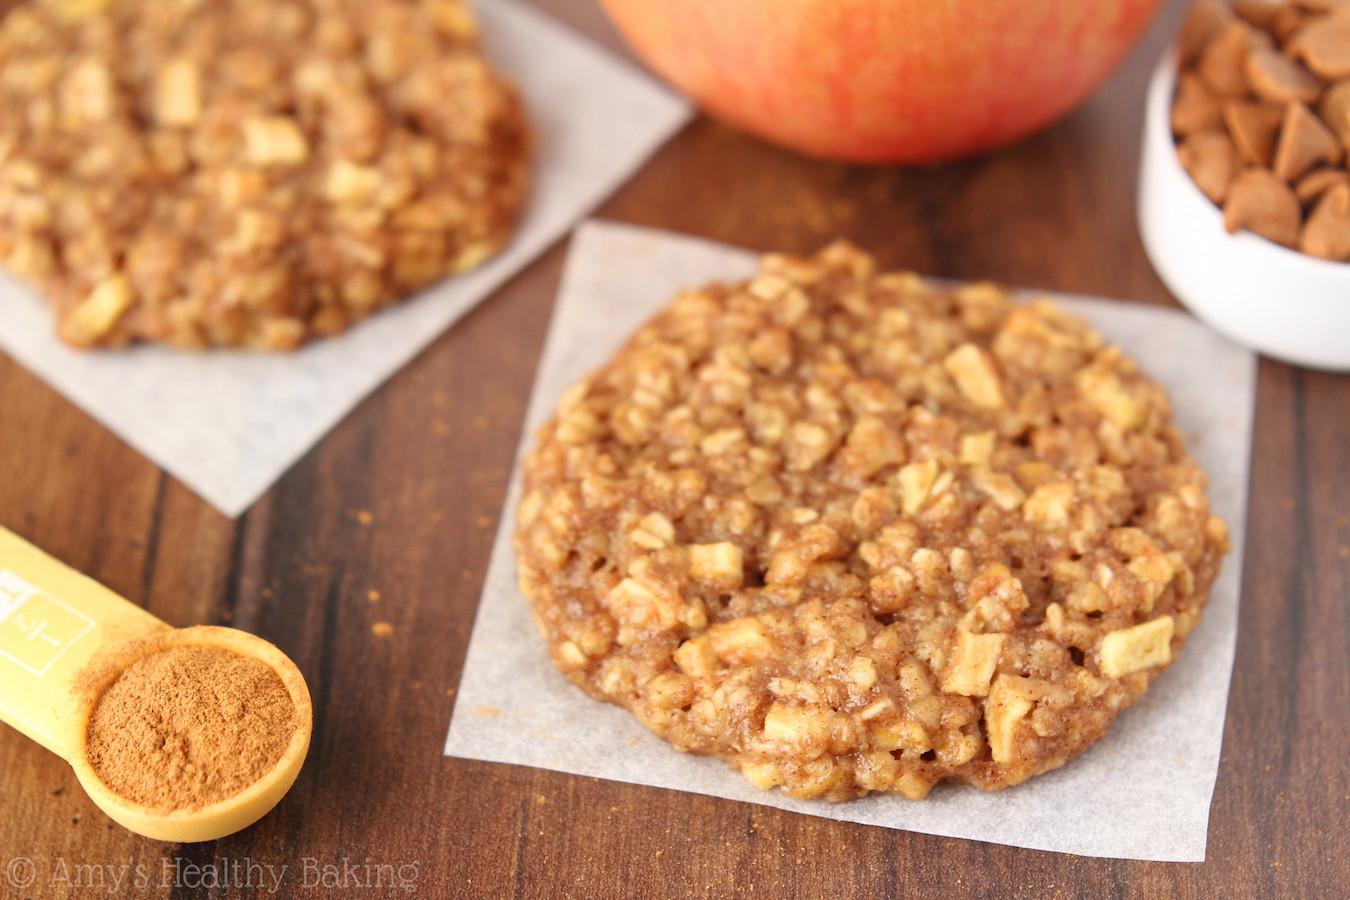 Oatmeal Cookies Recipe Healthy  Apple Pie Oatmeal Cookies Recipe Video